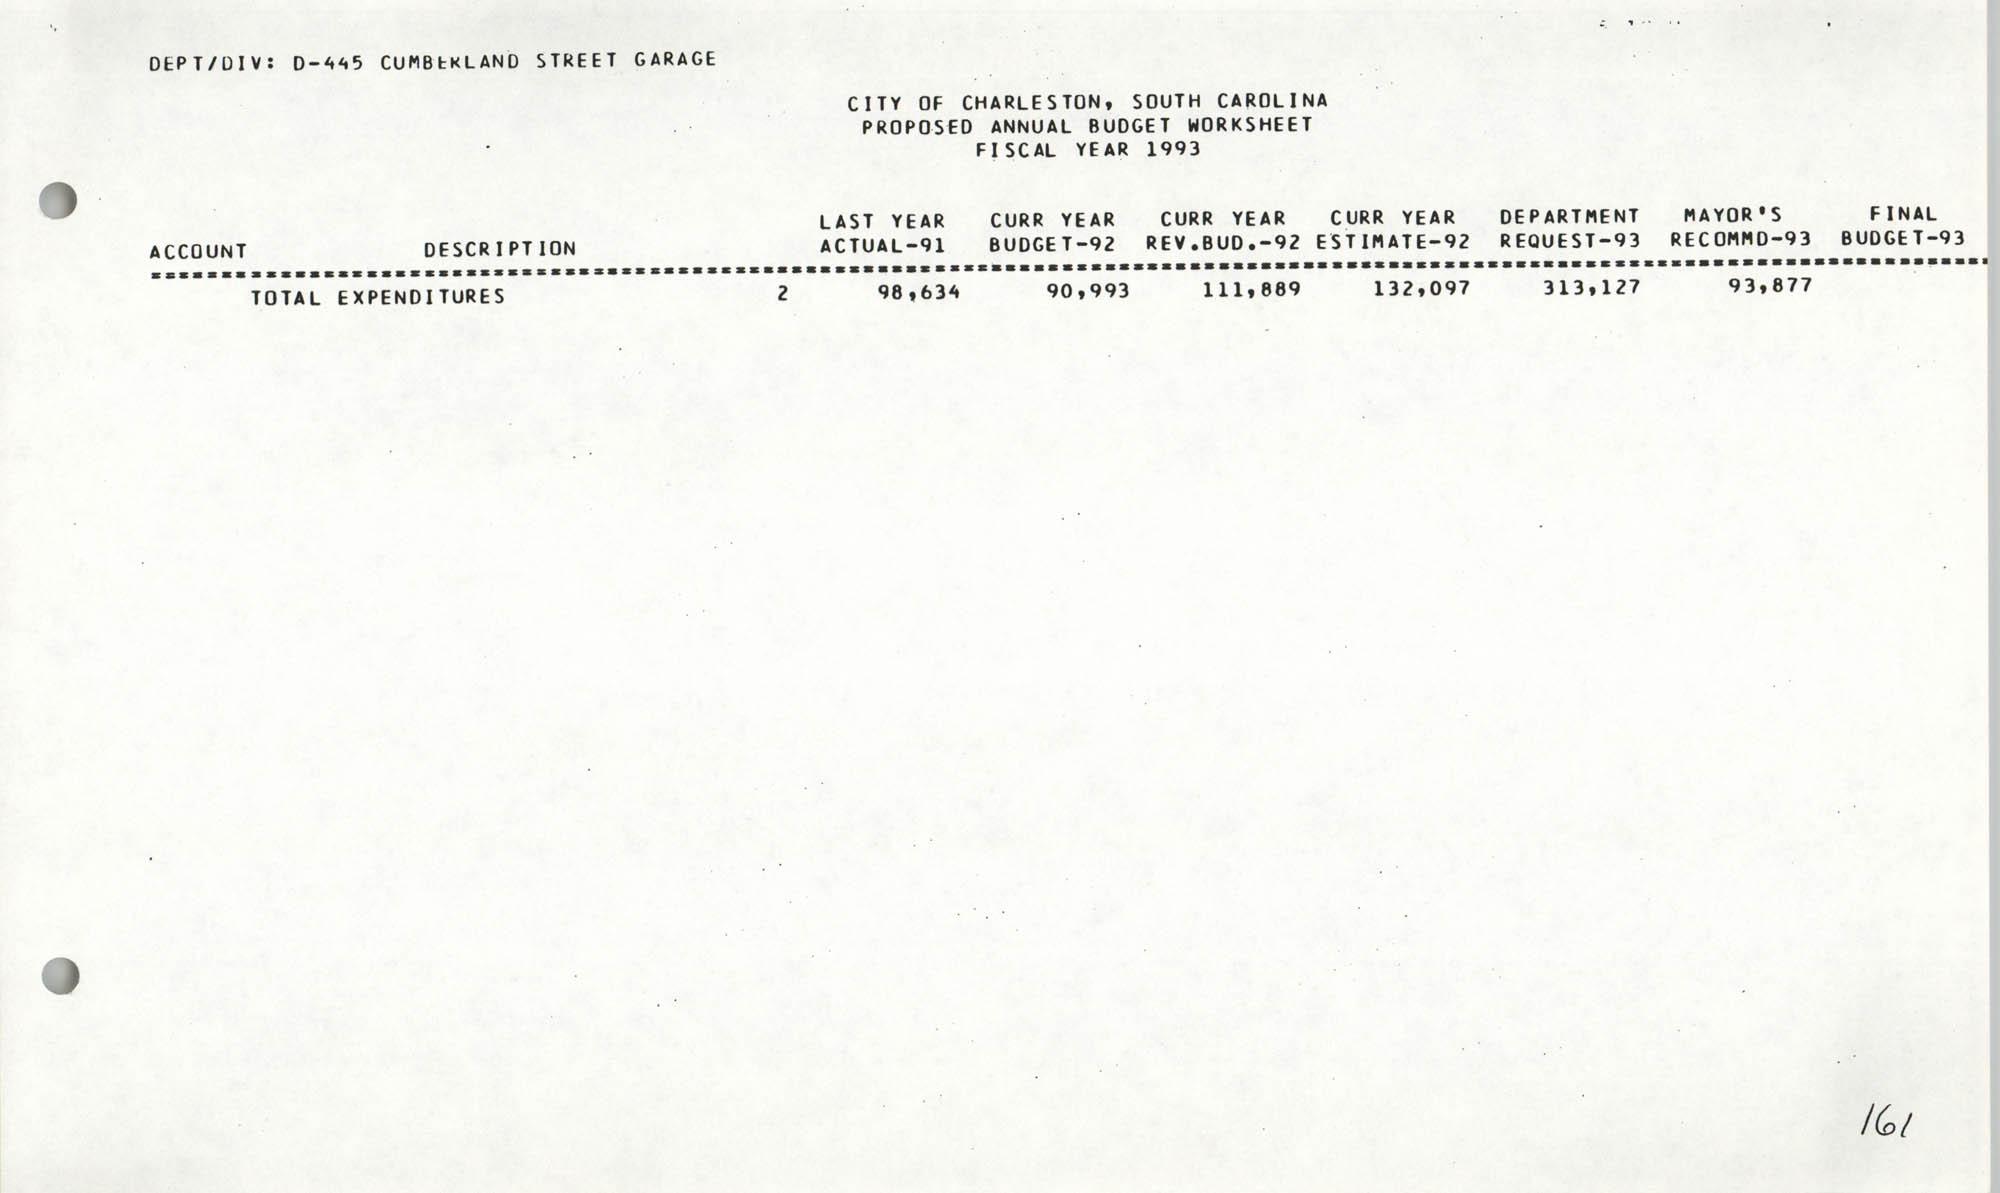 The City Council of Charleston, South Carolina, 1993 Budget, Page 161